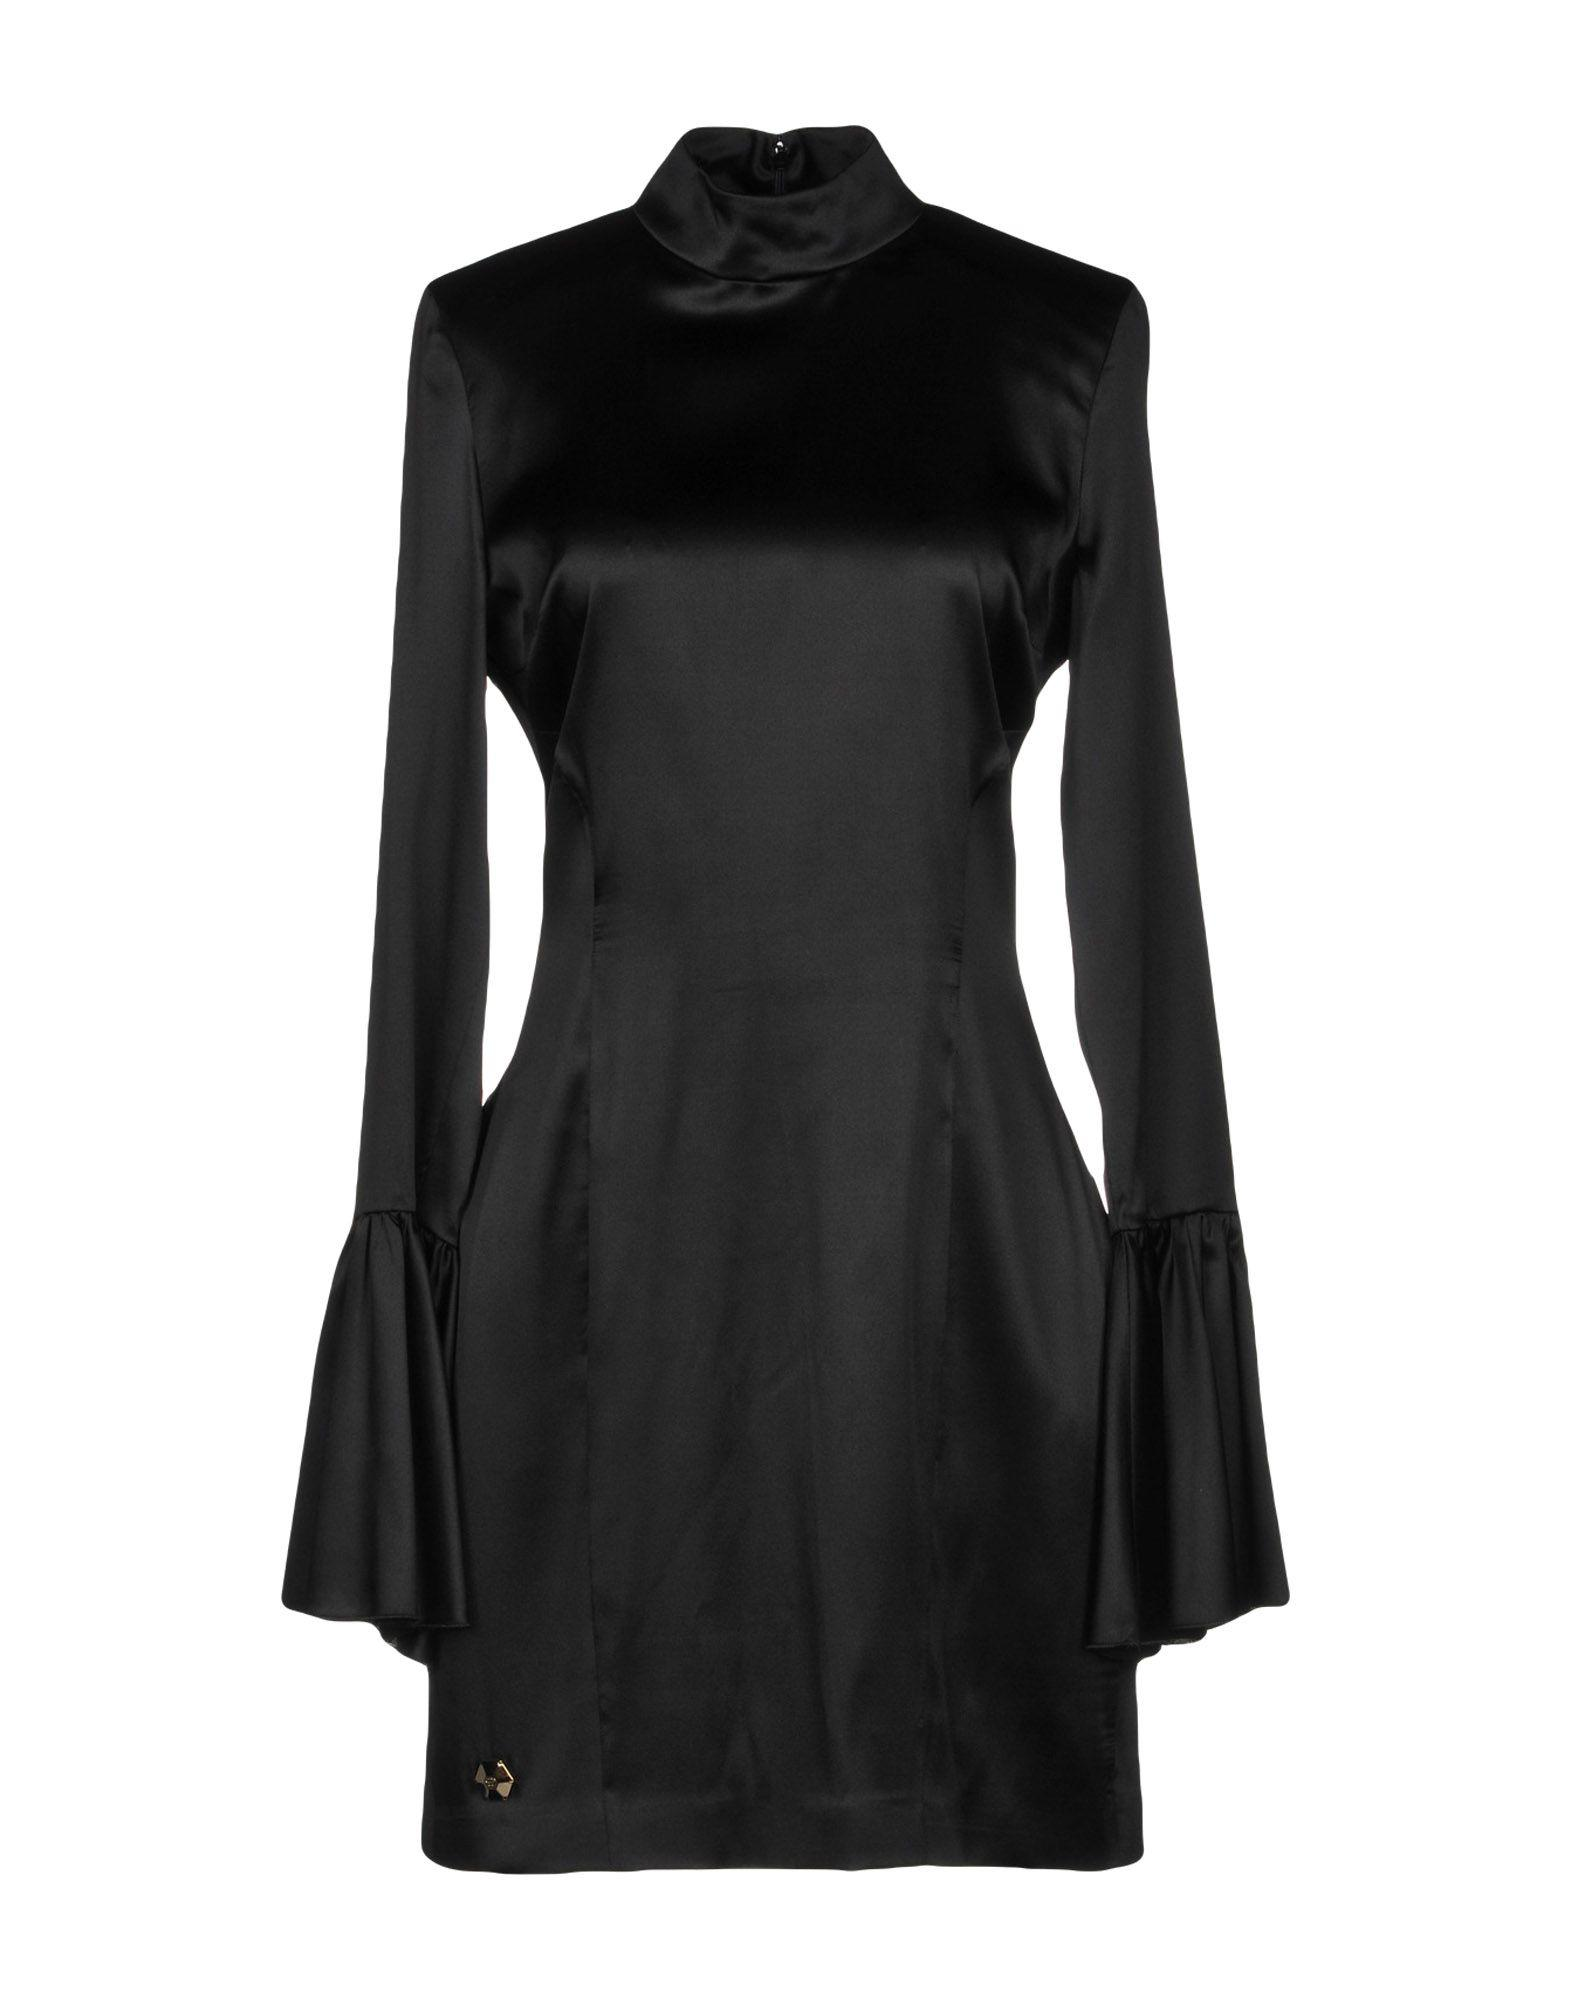 Philipp Plein Short Dress In Black